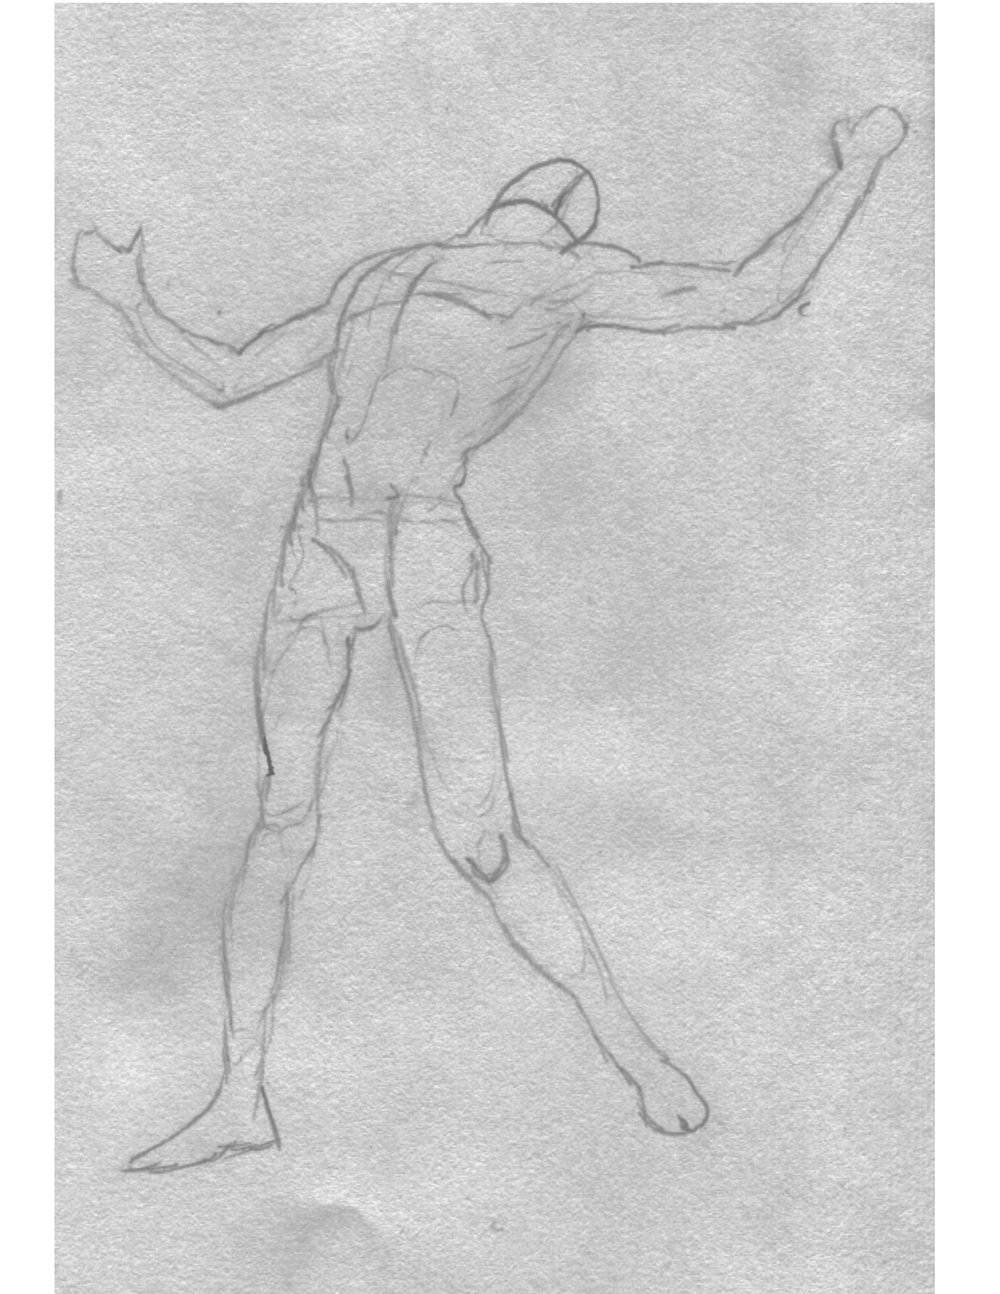 Life_Drawings_01.jpg